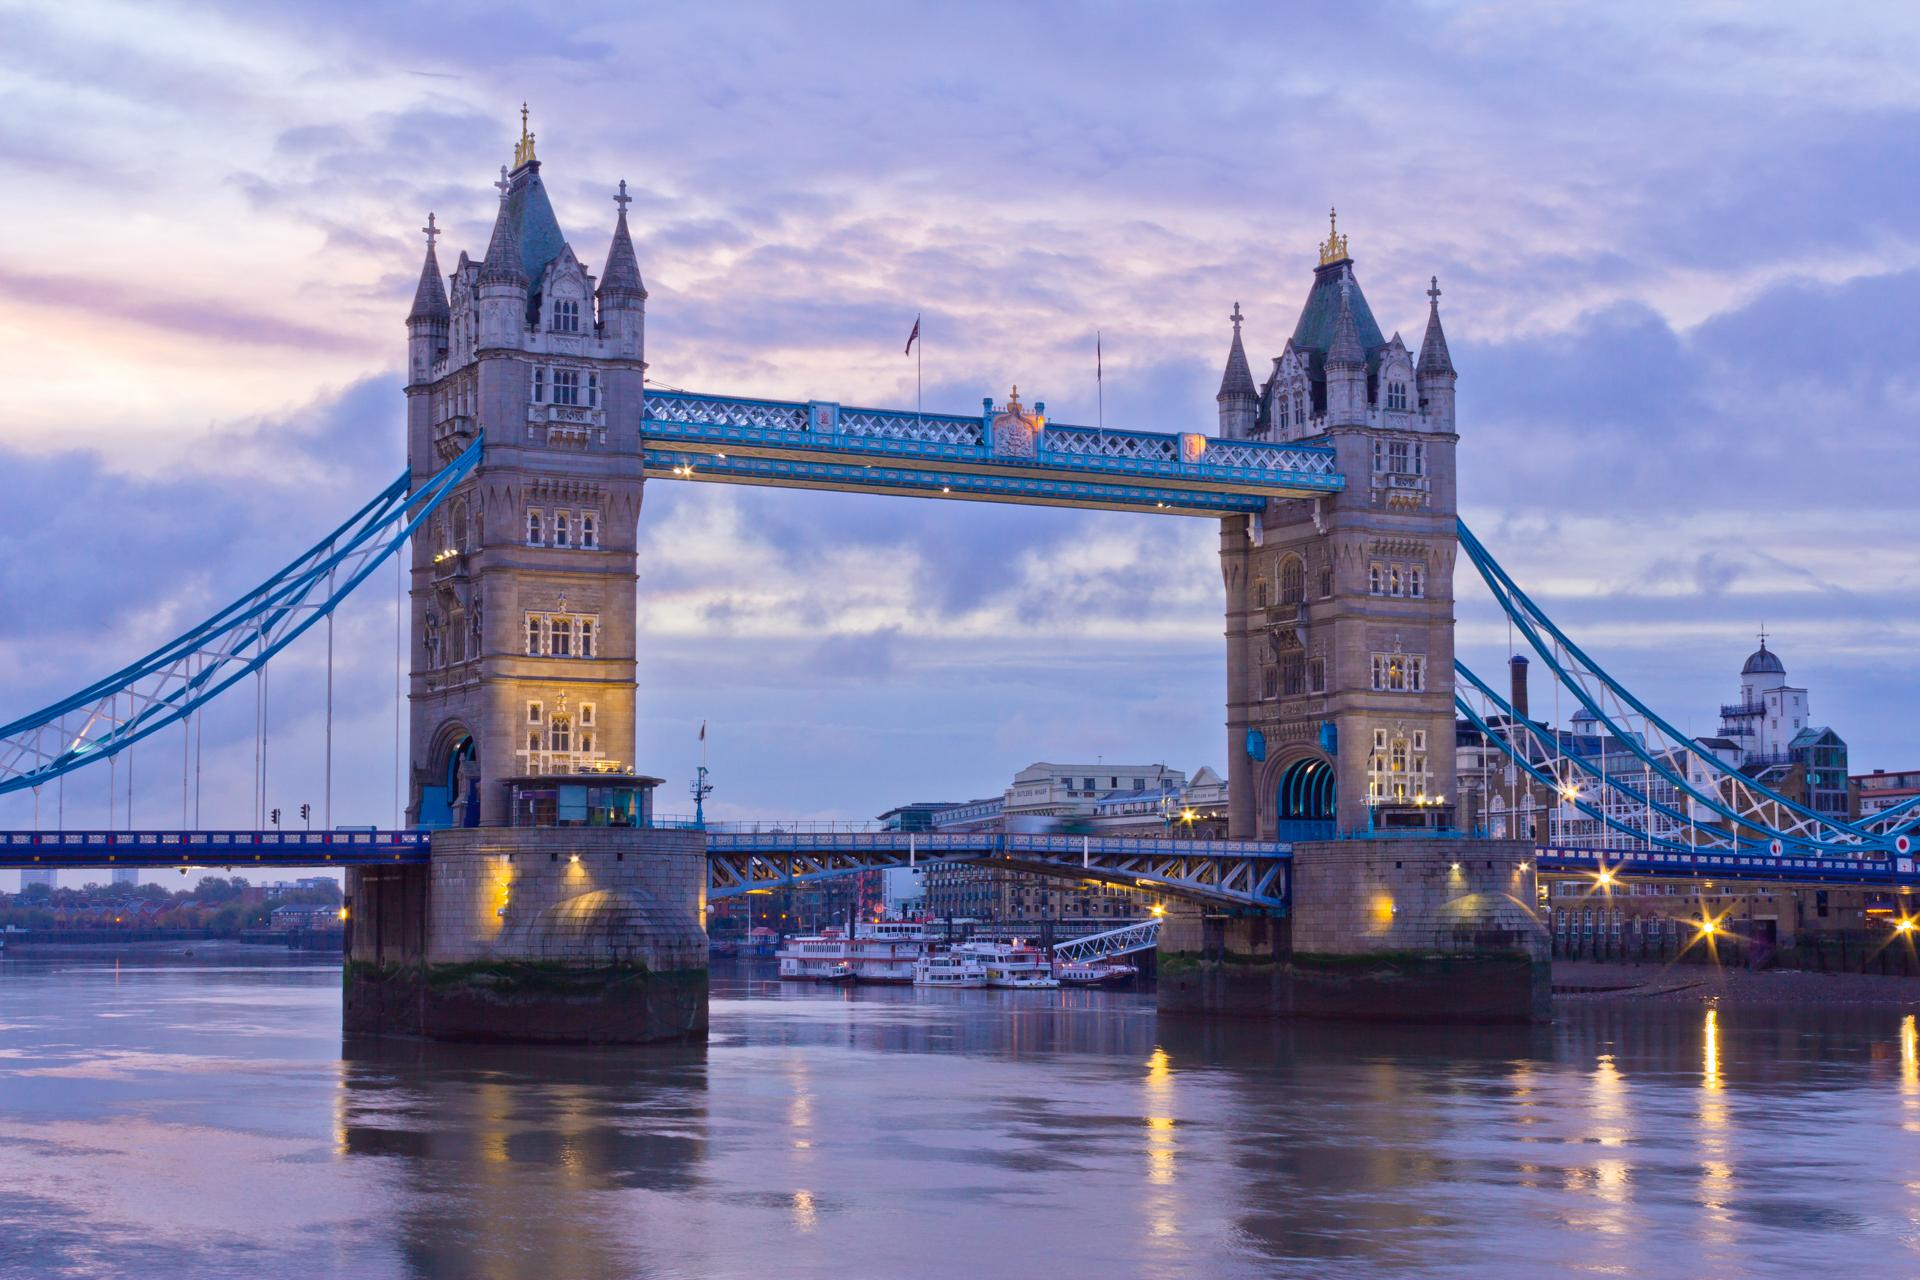 Tower Bridge, London, at dusk taken with a crop sensor camera